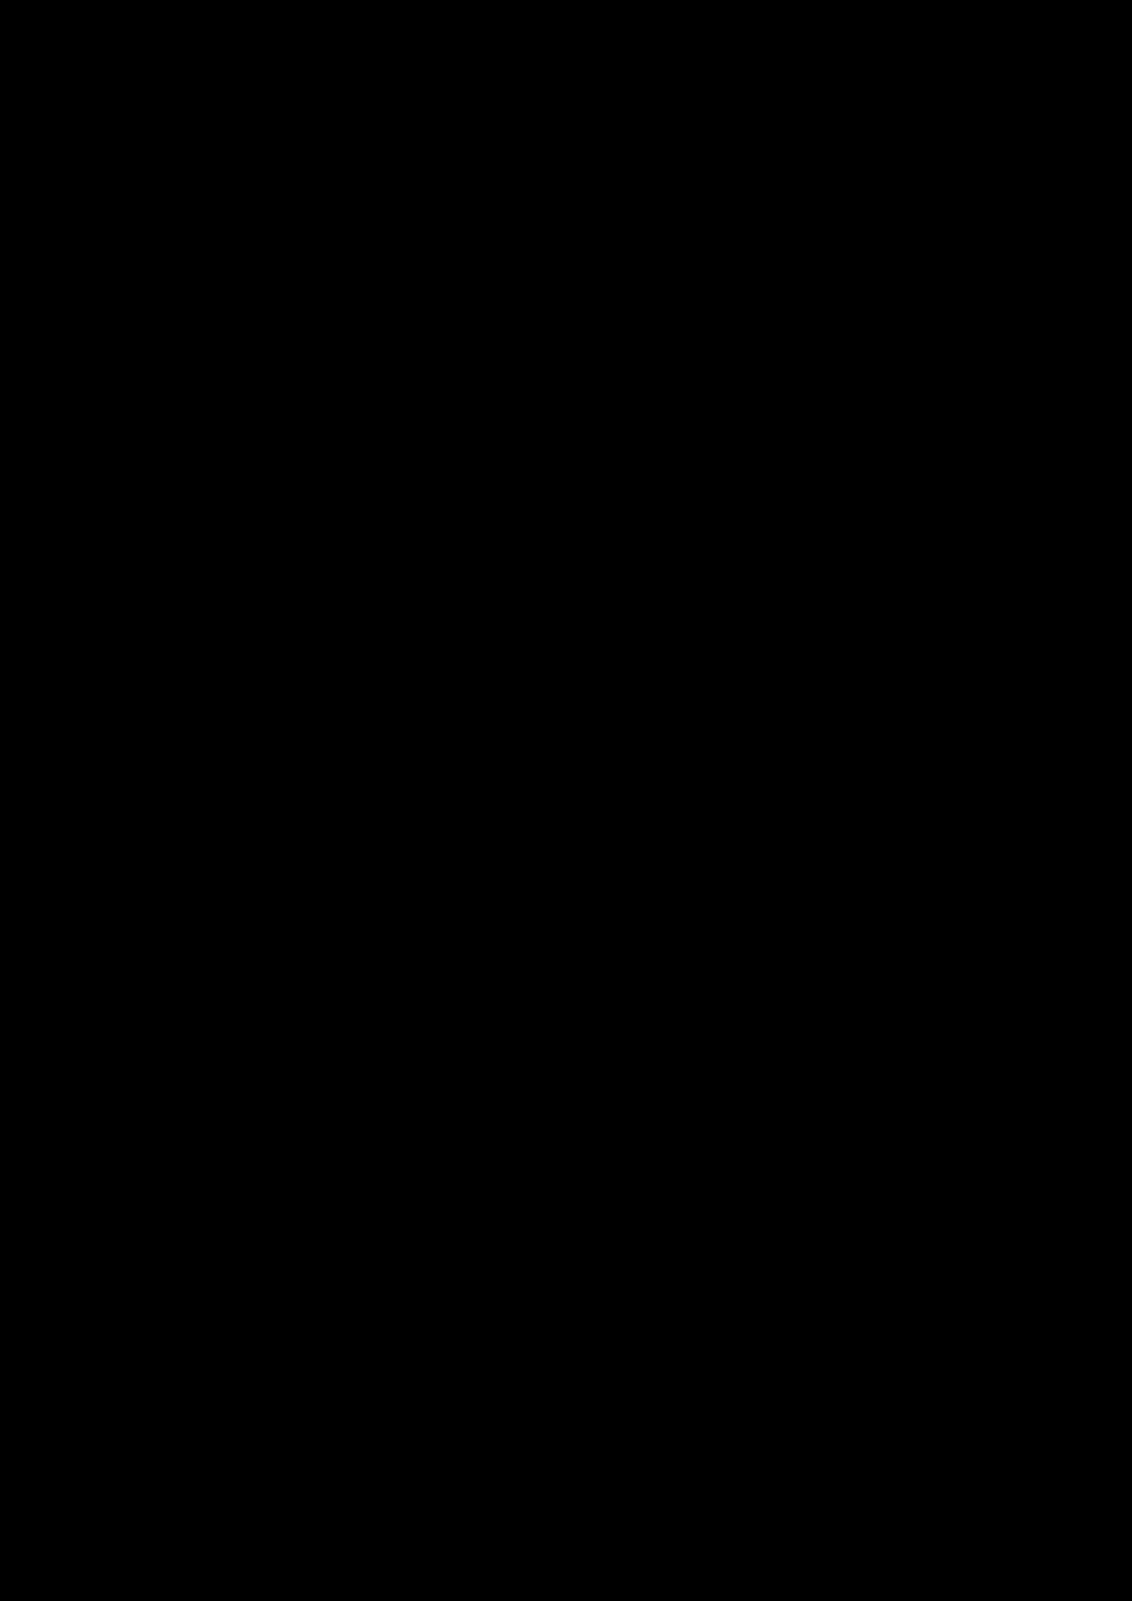 Belyiy sokol slide, Image 83